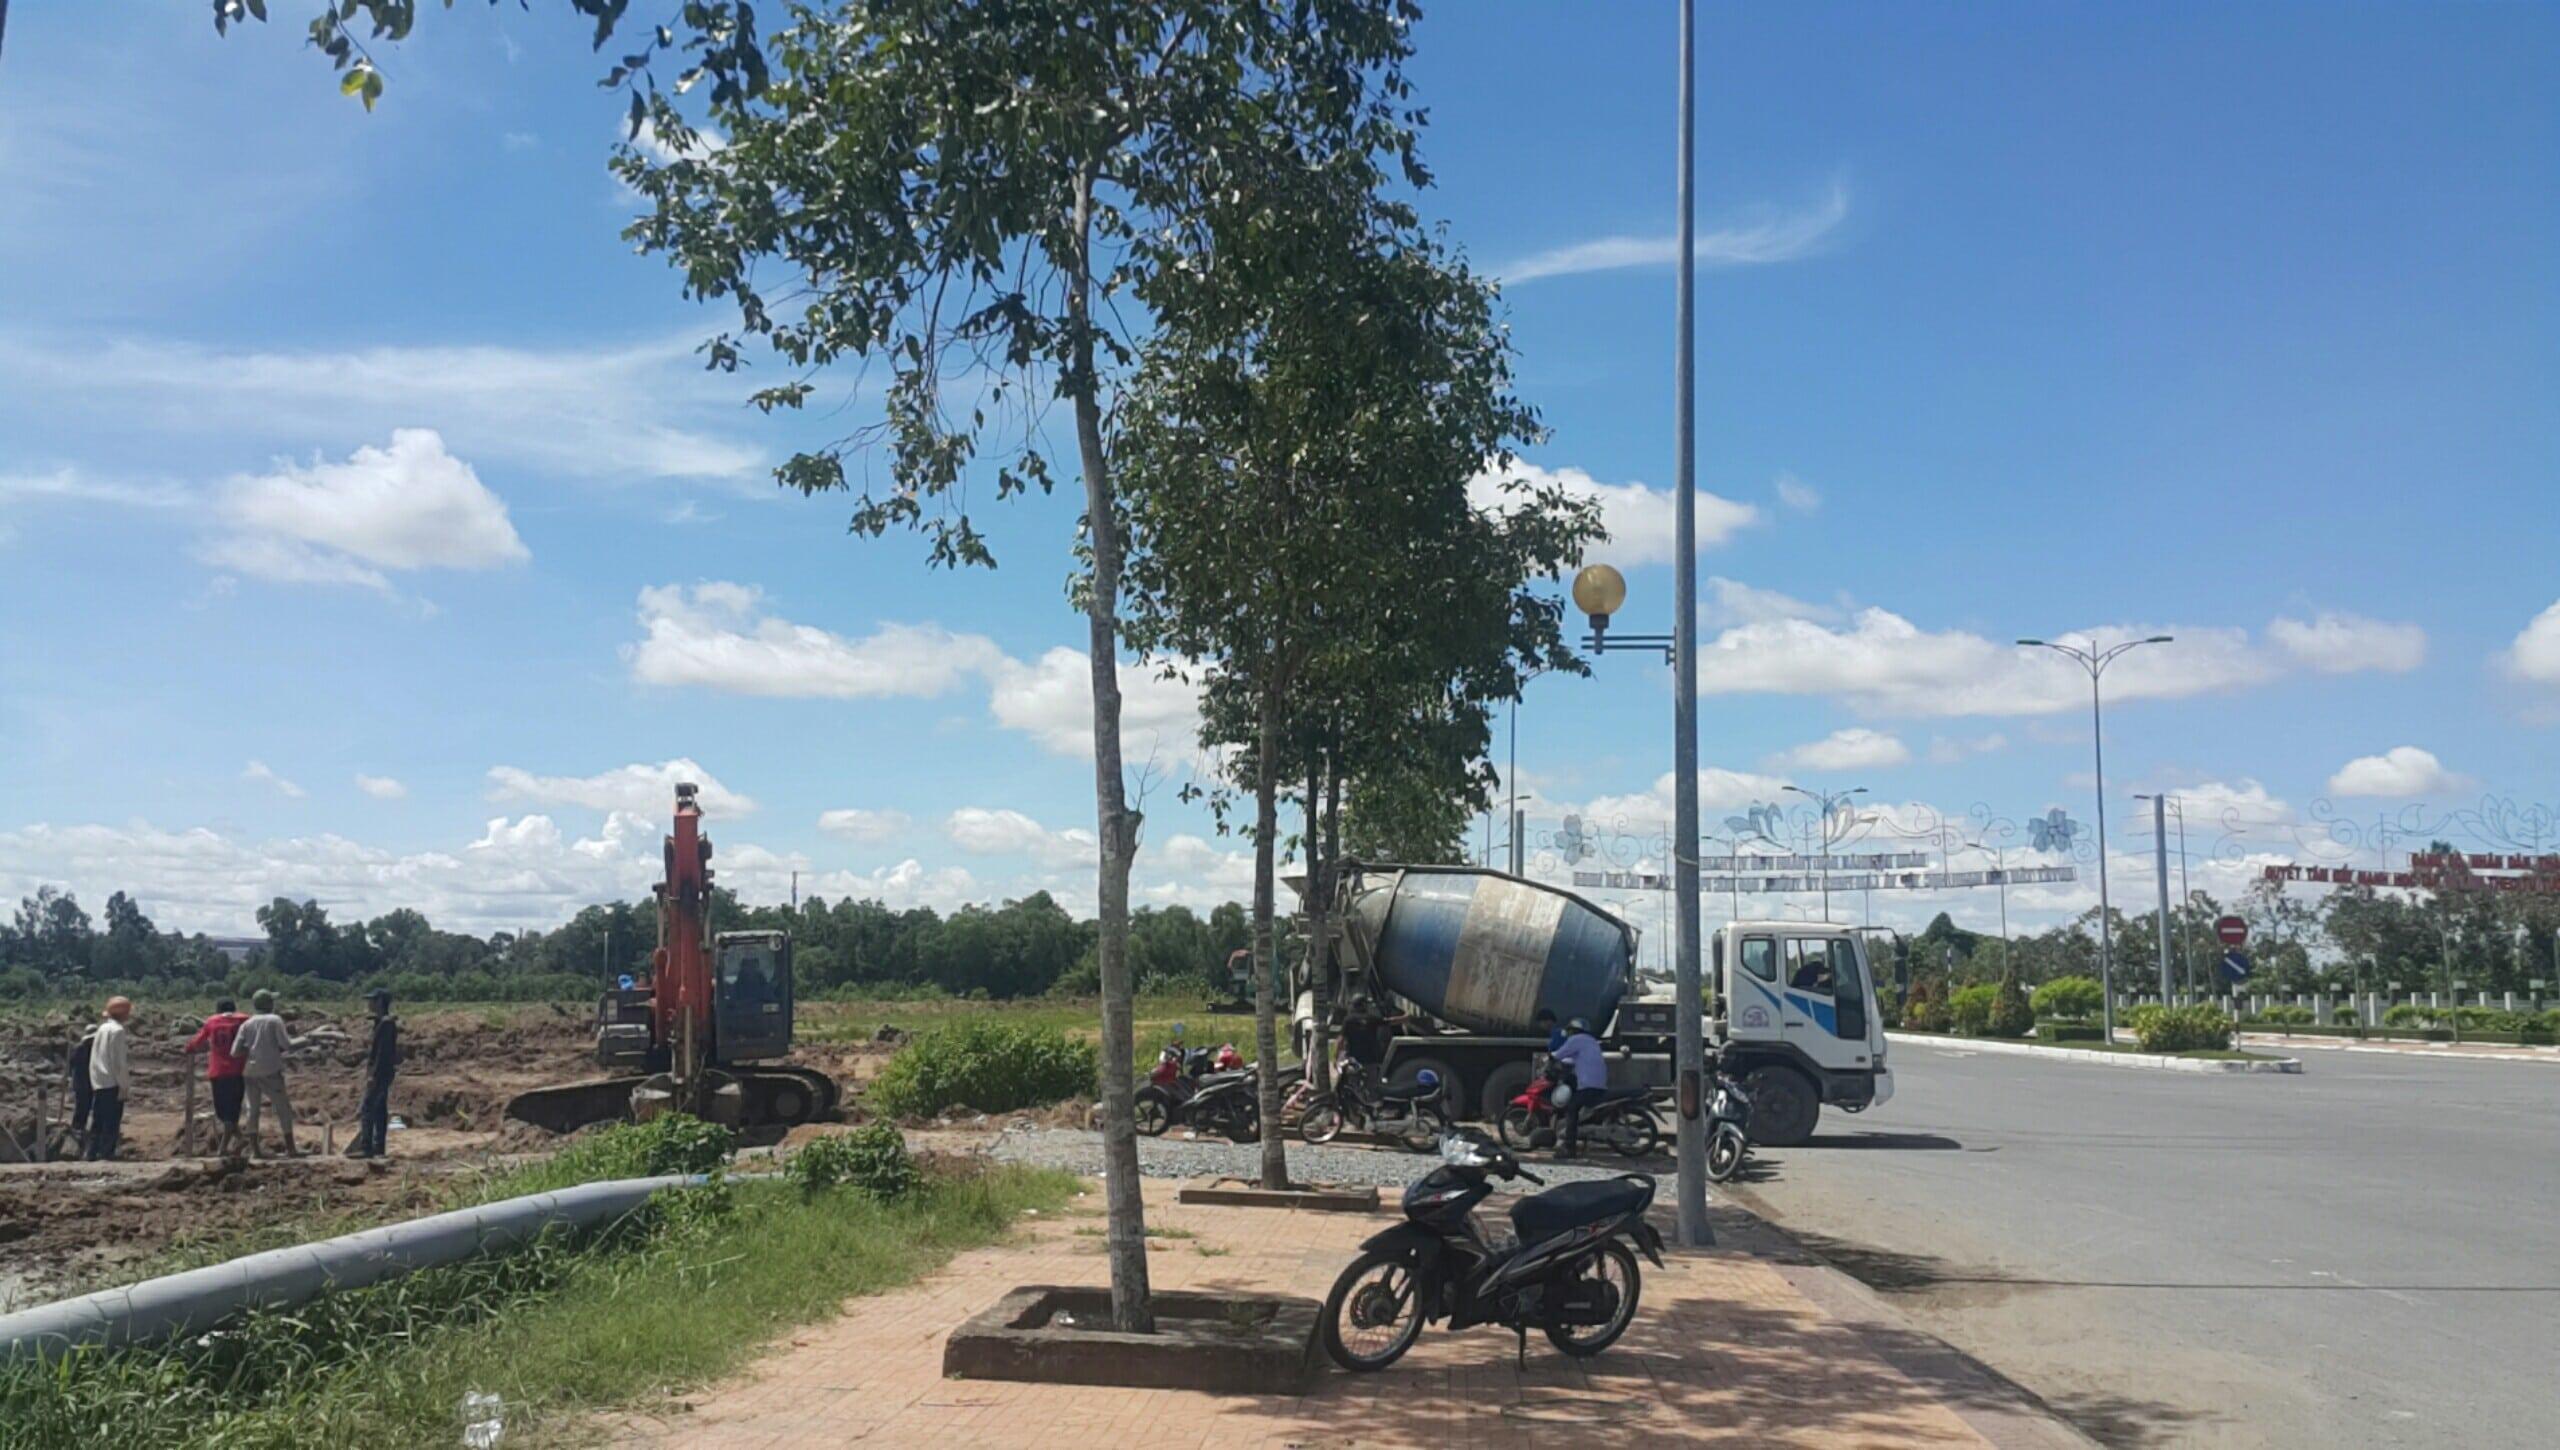 Hinh anh tien do thi cong DIC Victory City Hau Giang - DIC VICTORY CITY